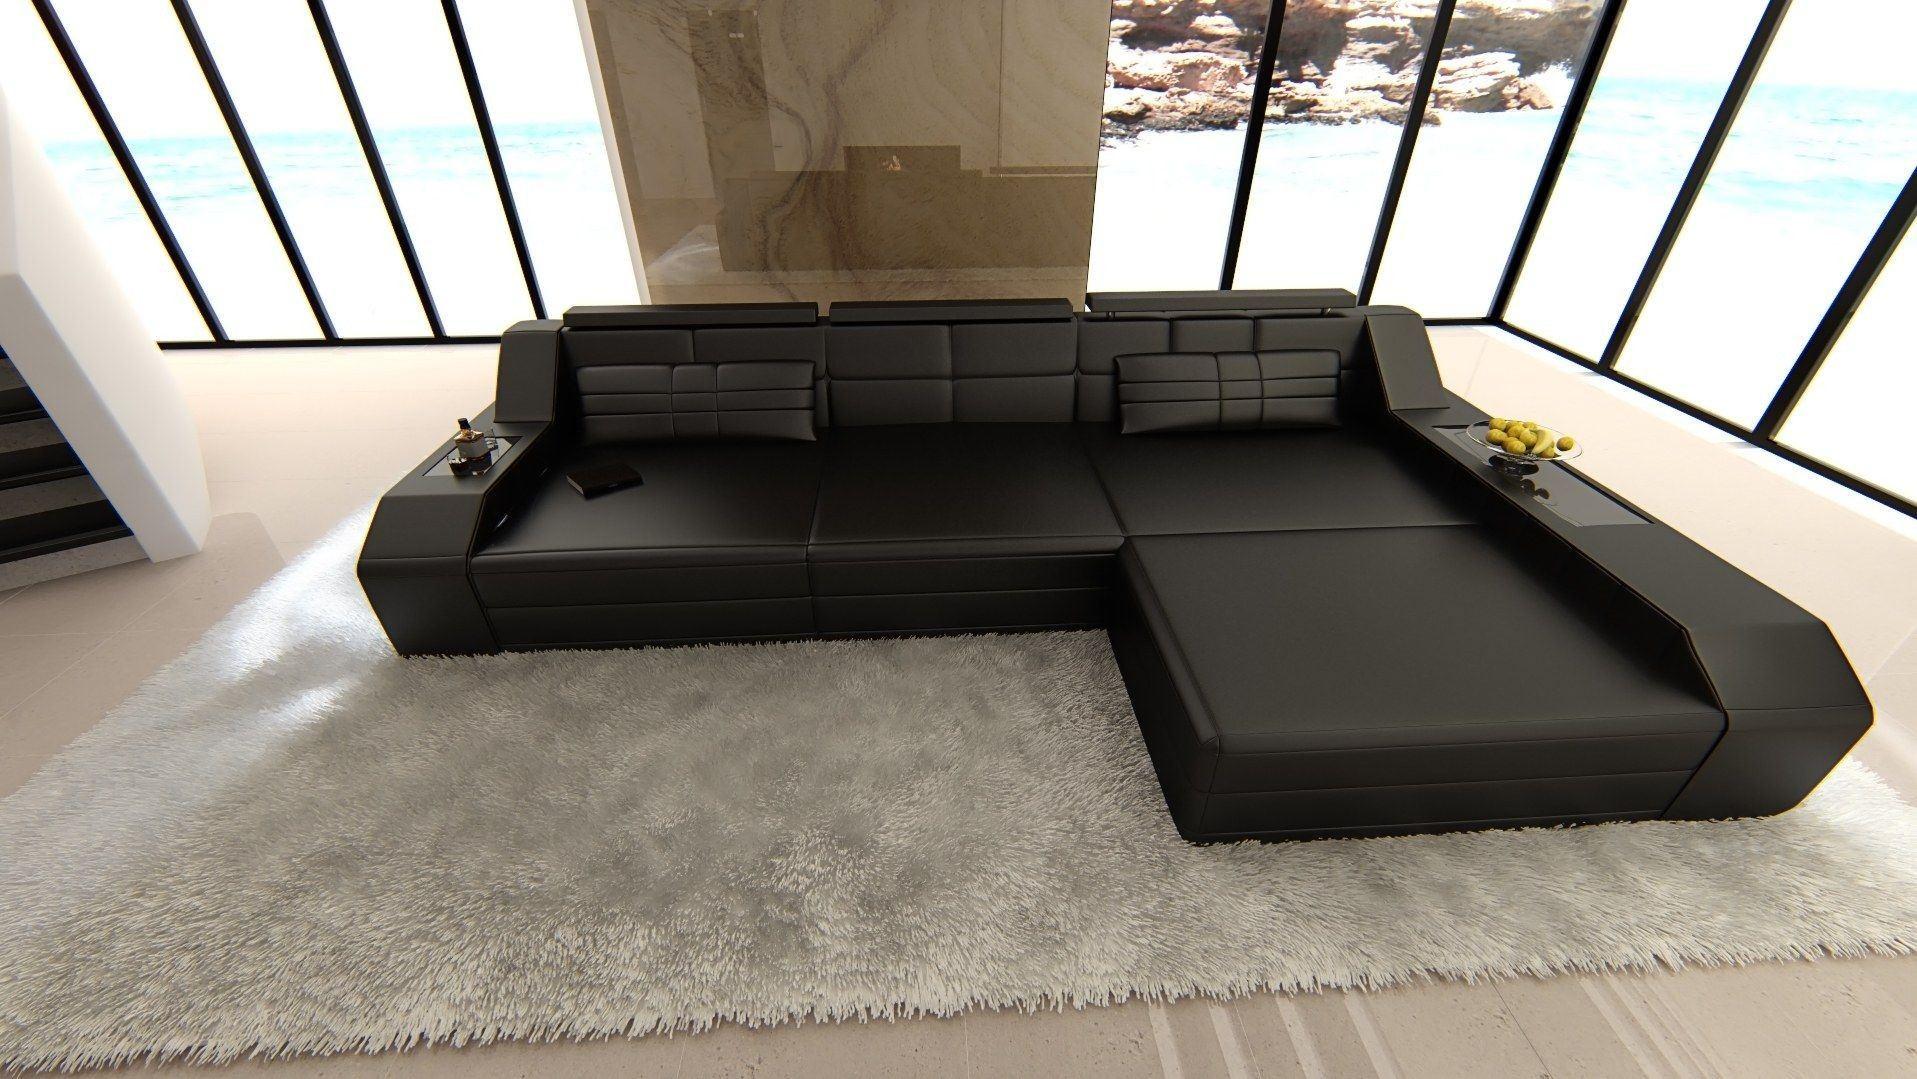 ledersofa arezzo l form schwarz schwarz. Black Bedroom Furniture Sets. Home Design Ideas